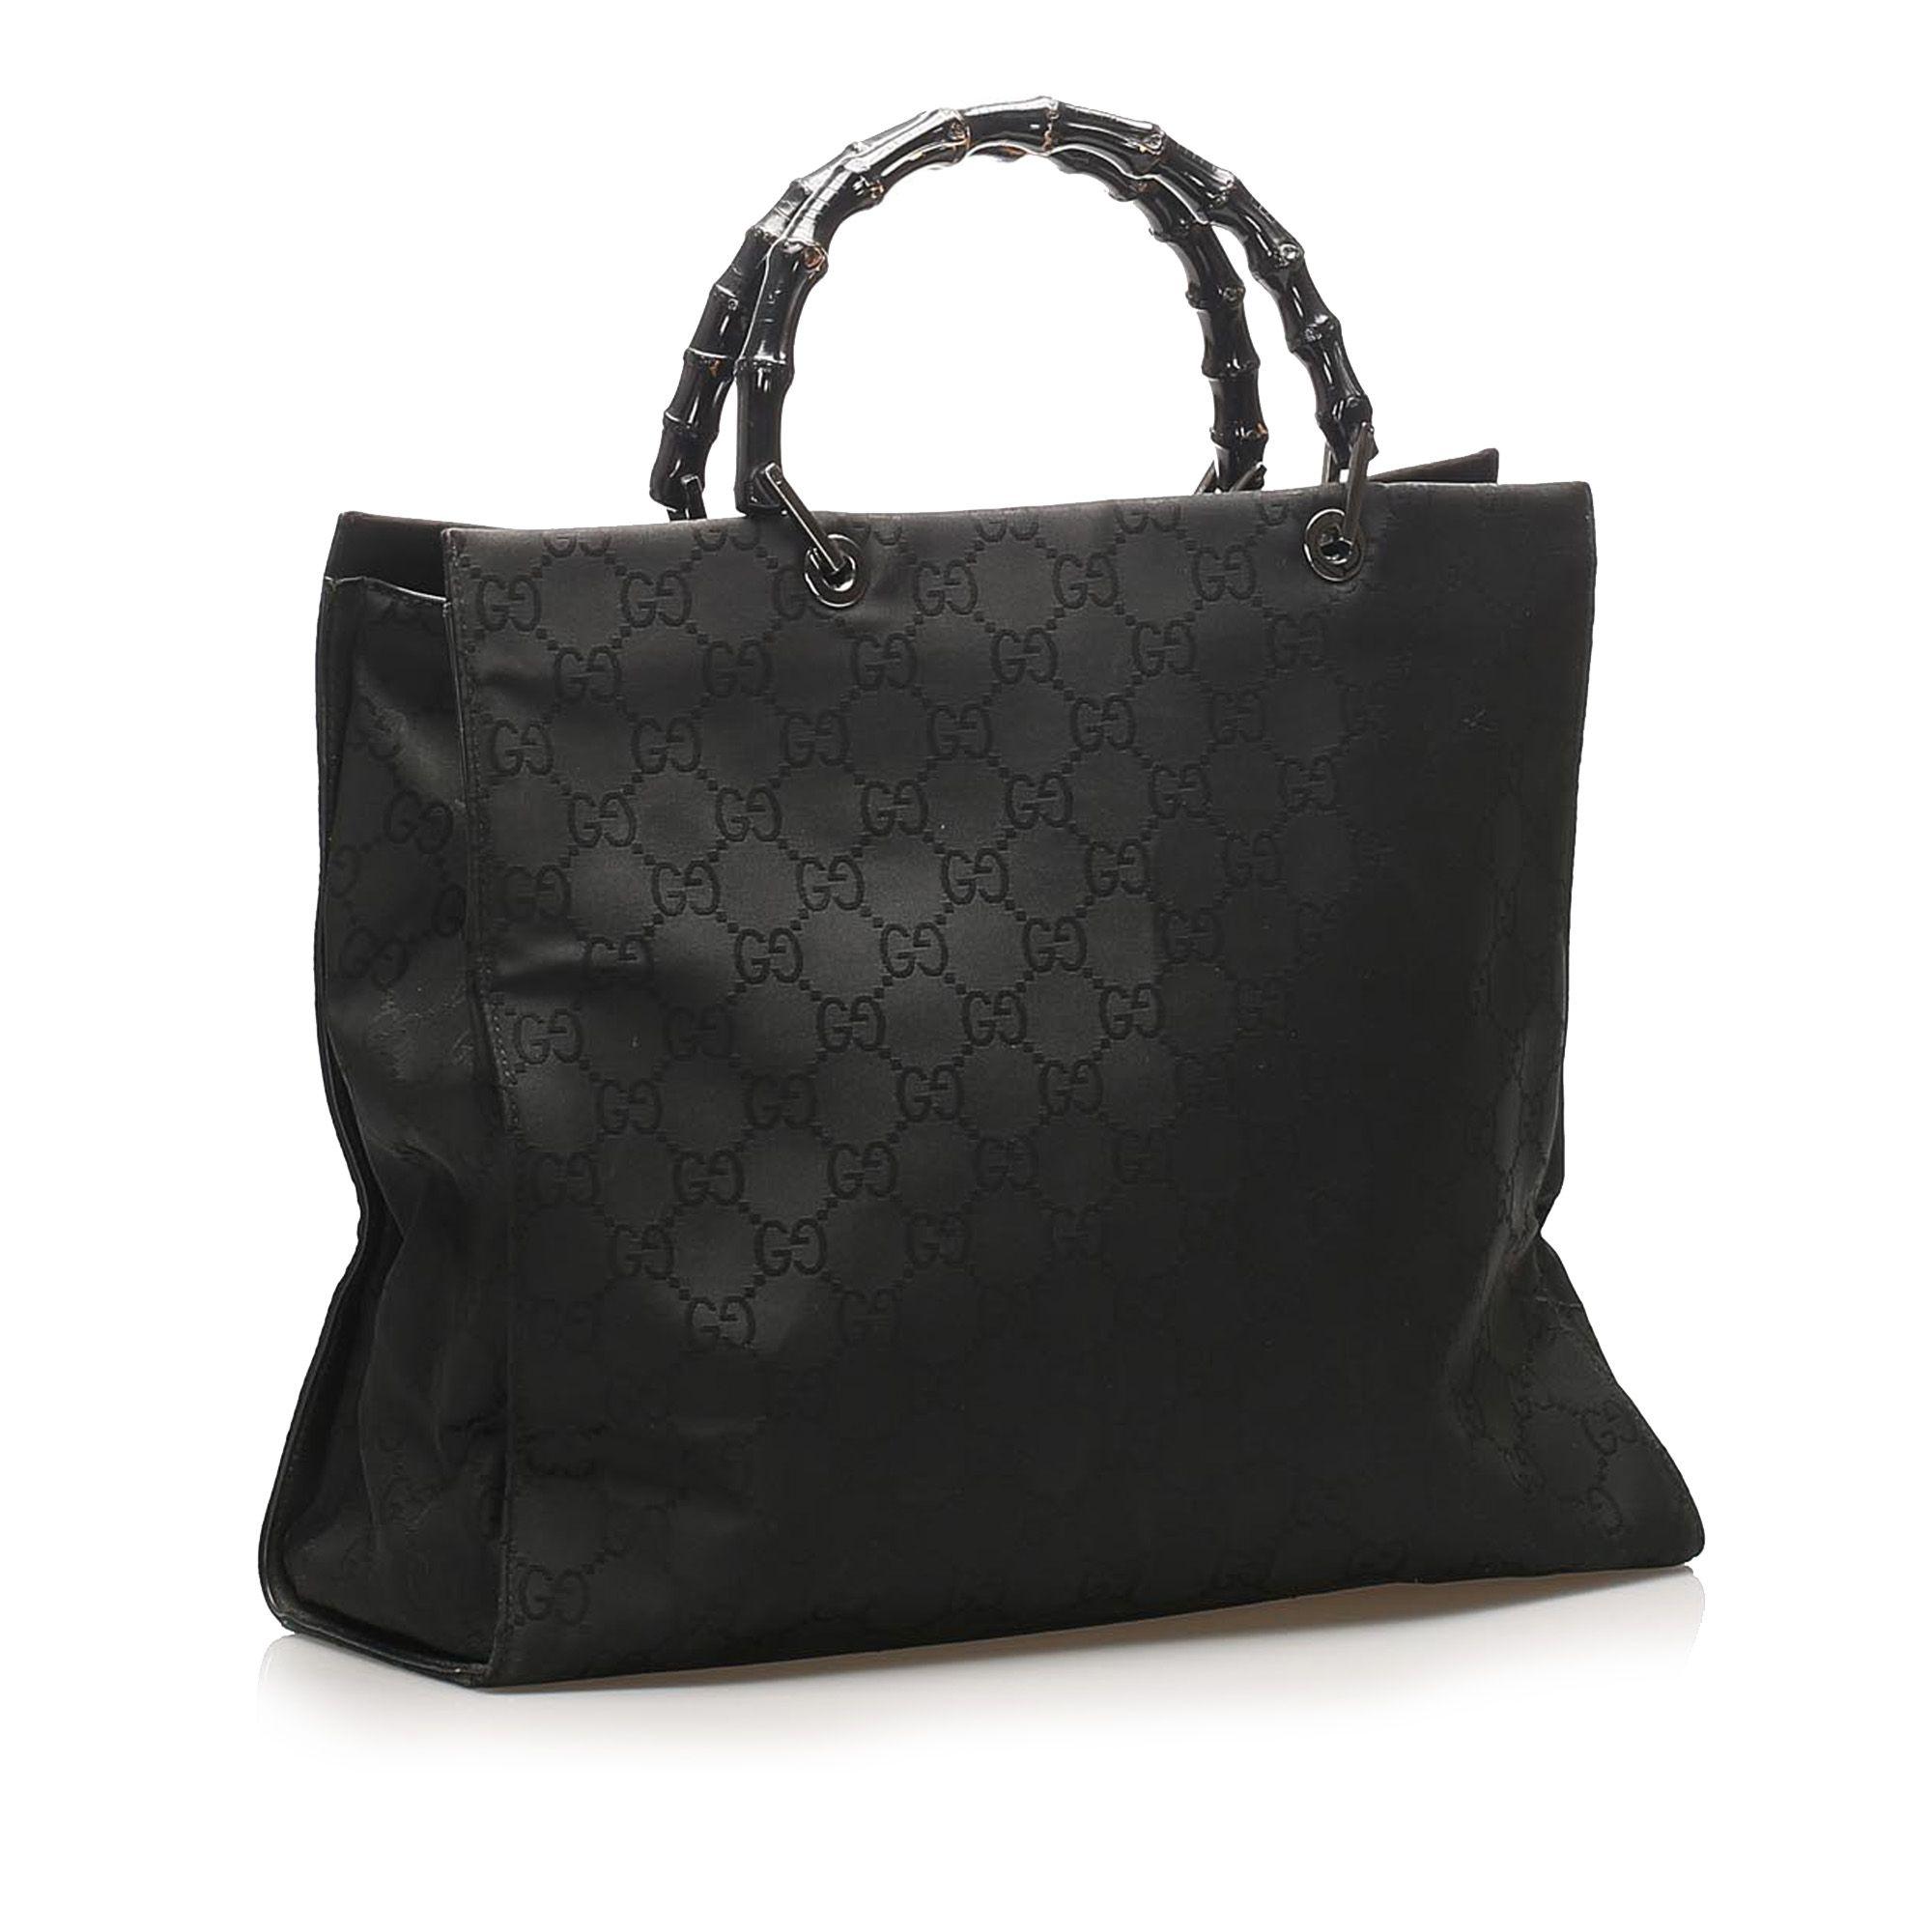 Vintage Gucci GG Nylon Bamboo Tote Bag Black